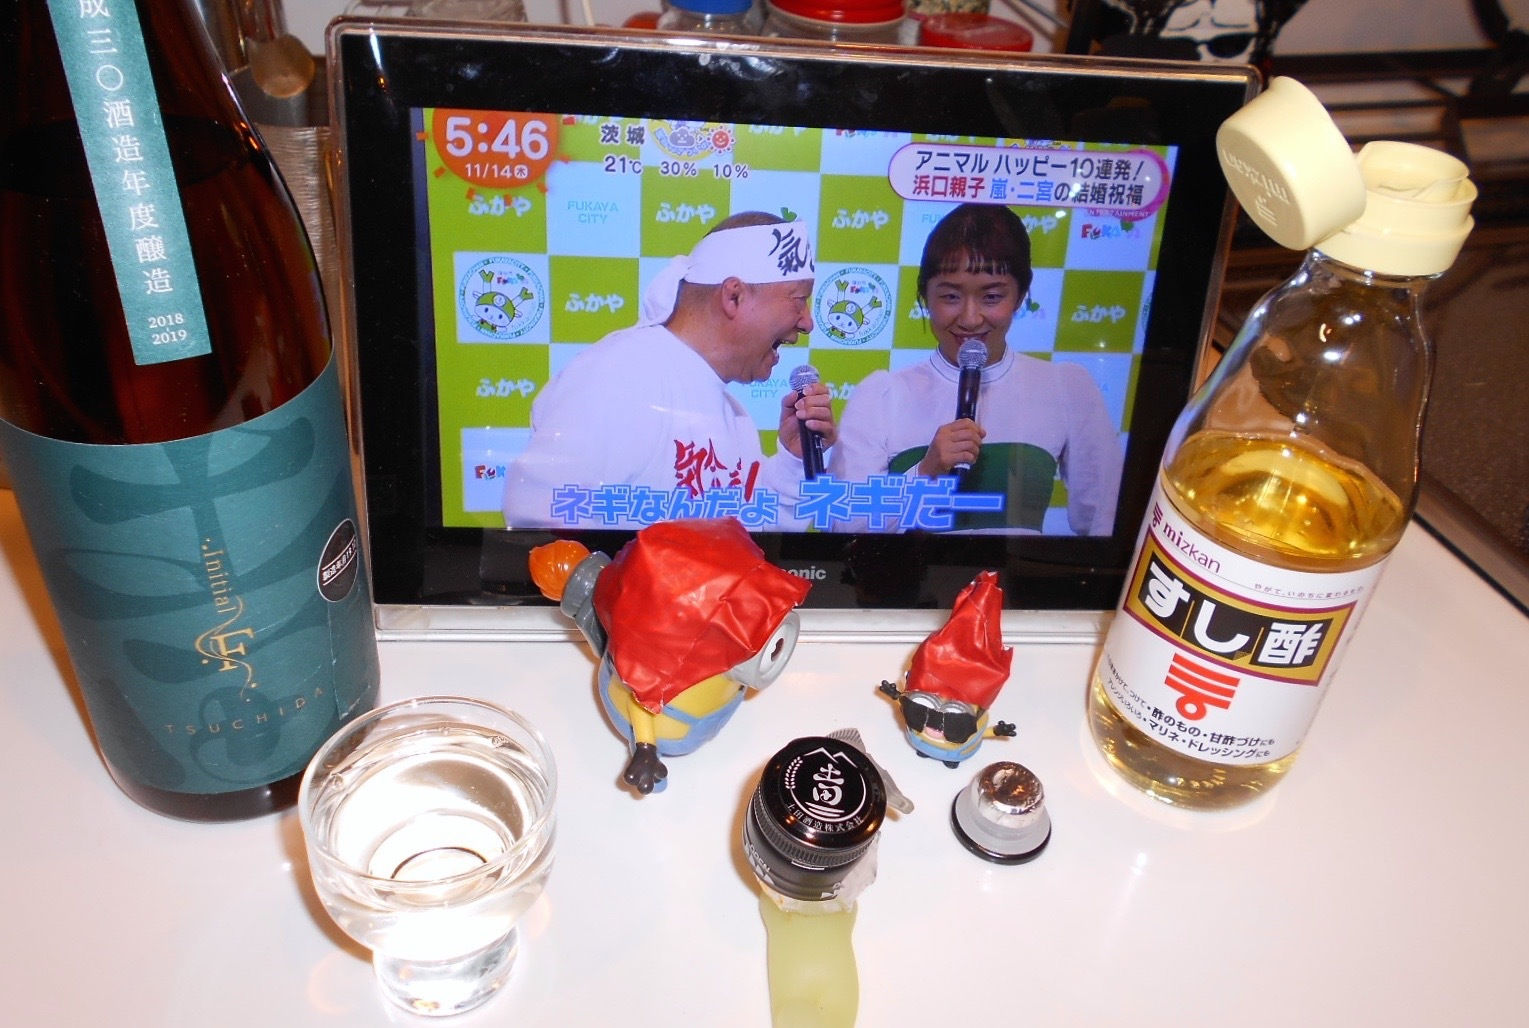 tsuchida_f30by3.jpg